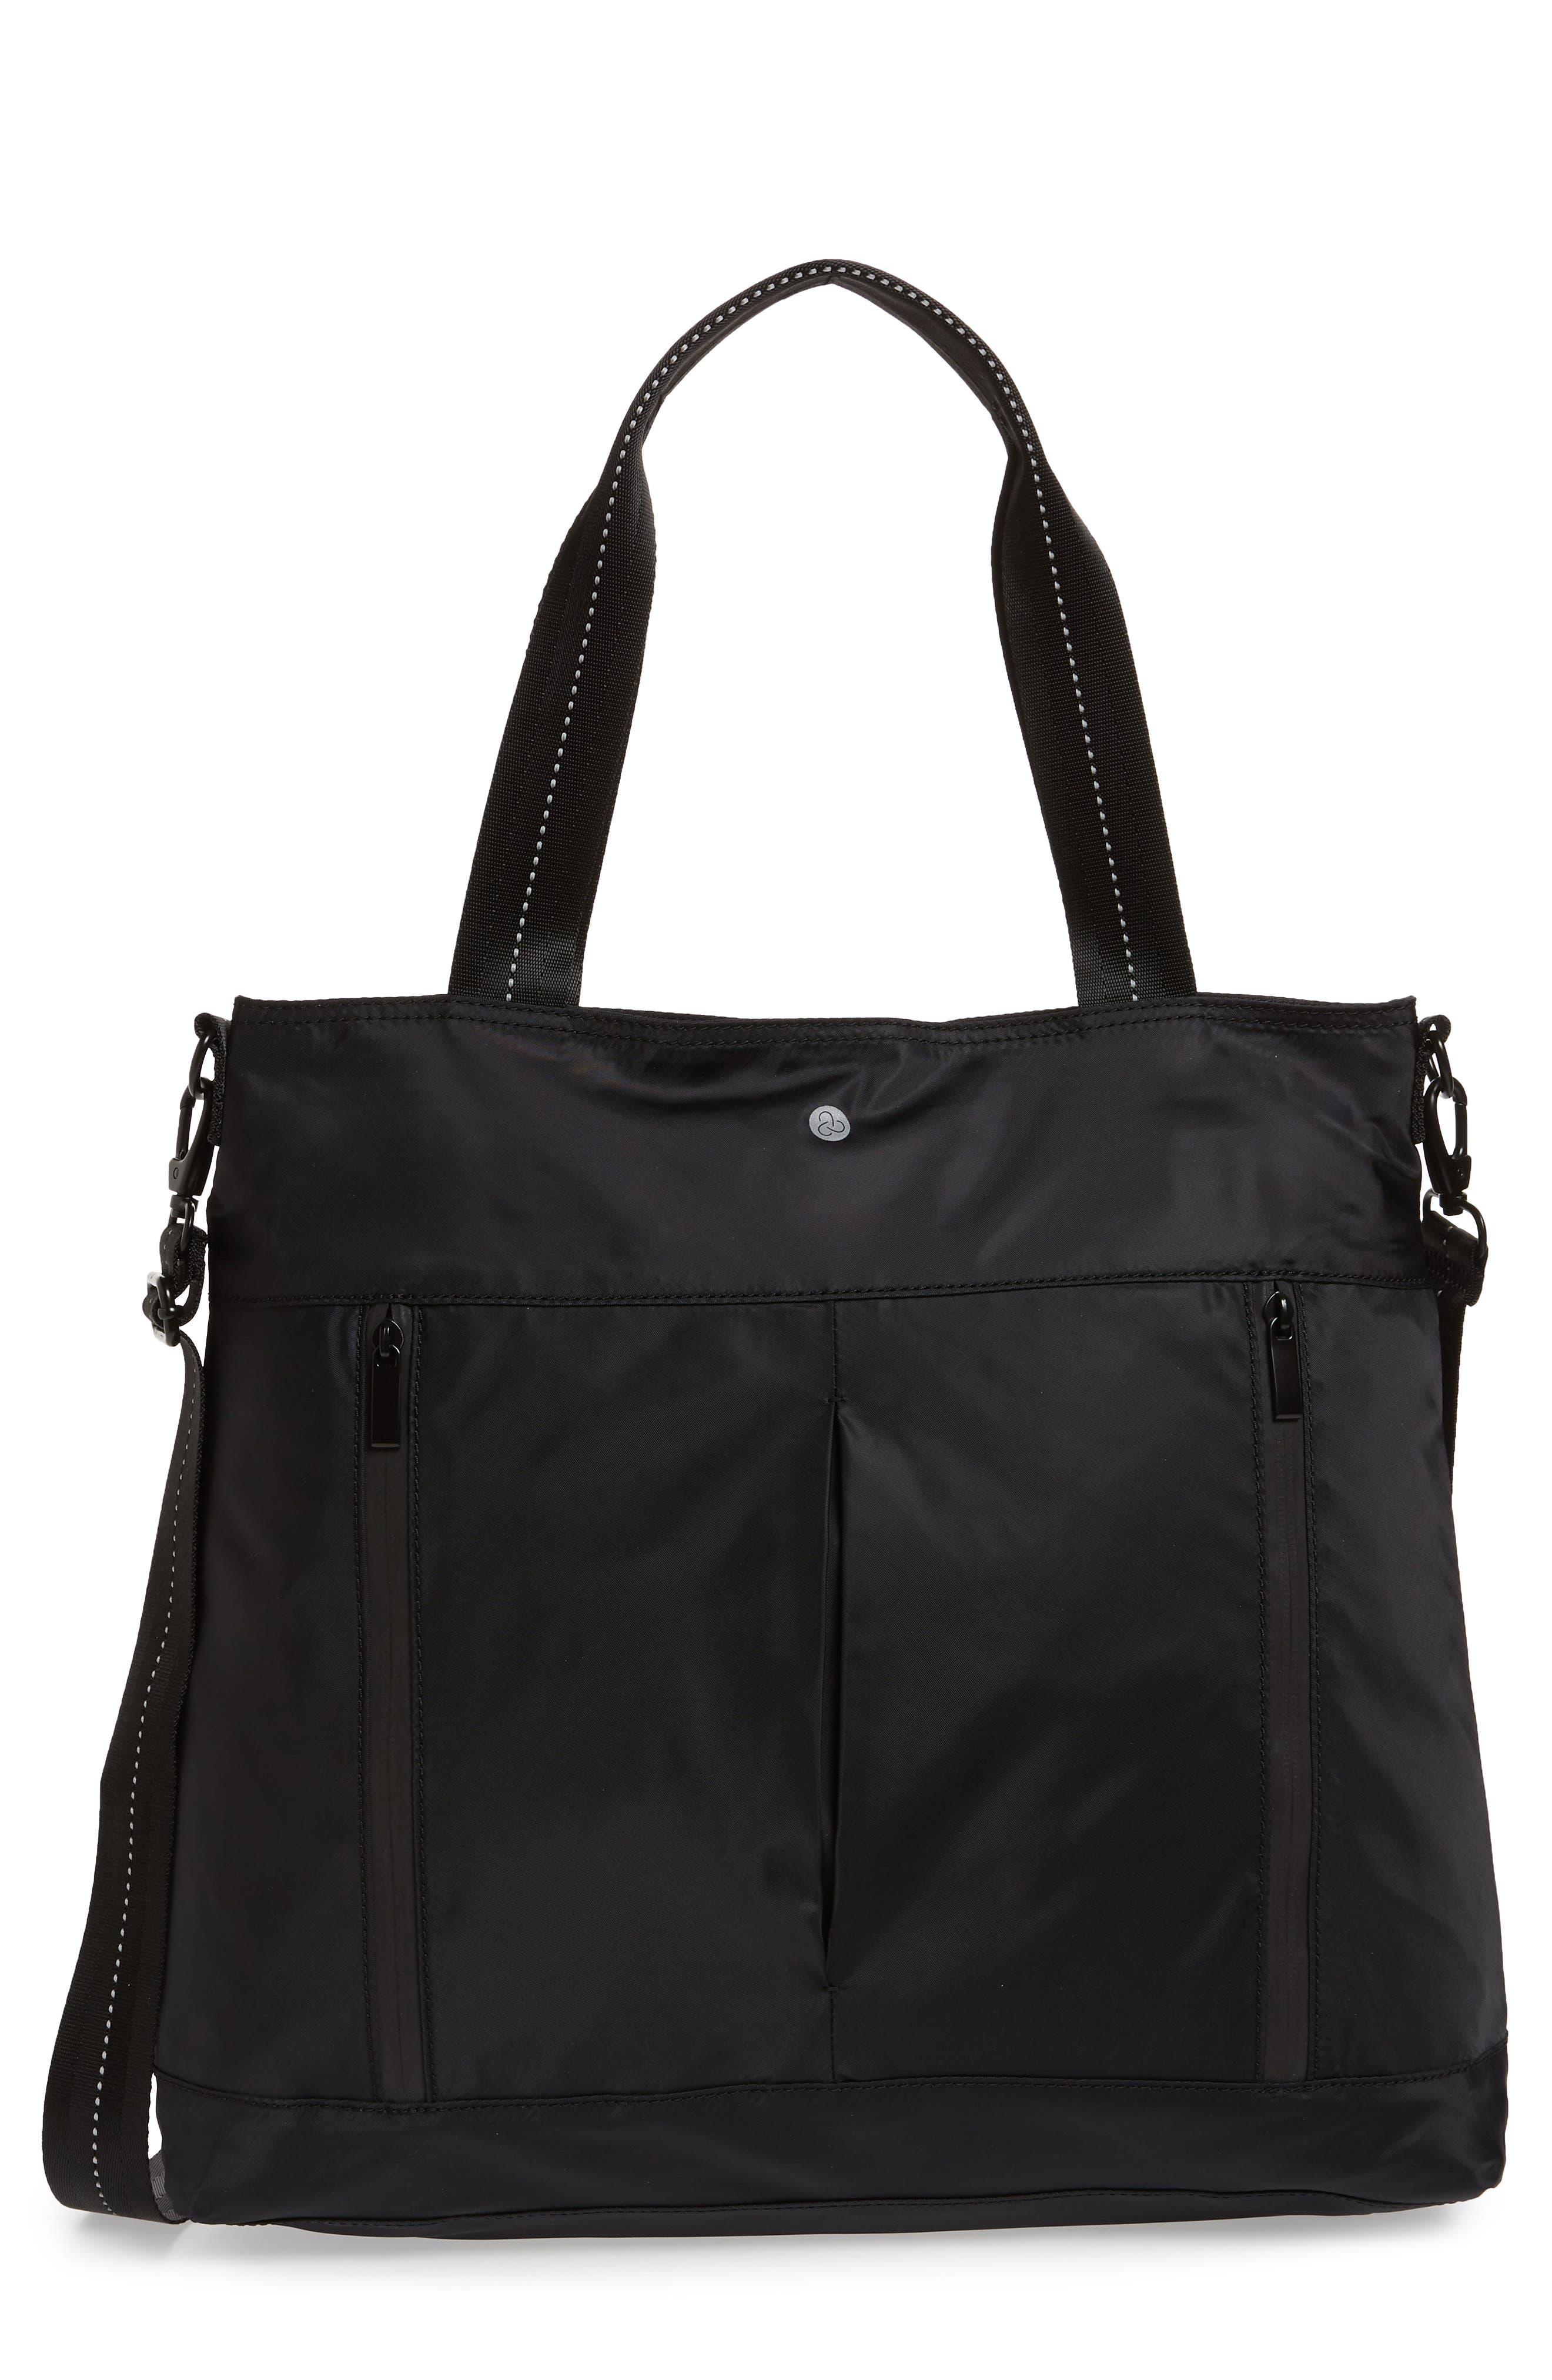 ZELLA, Reflective Nylon Tote Bag, Main thumbnail 1, color, BLACK